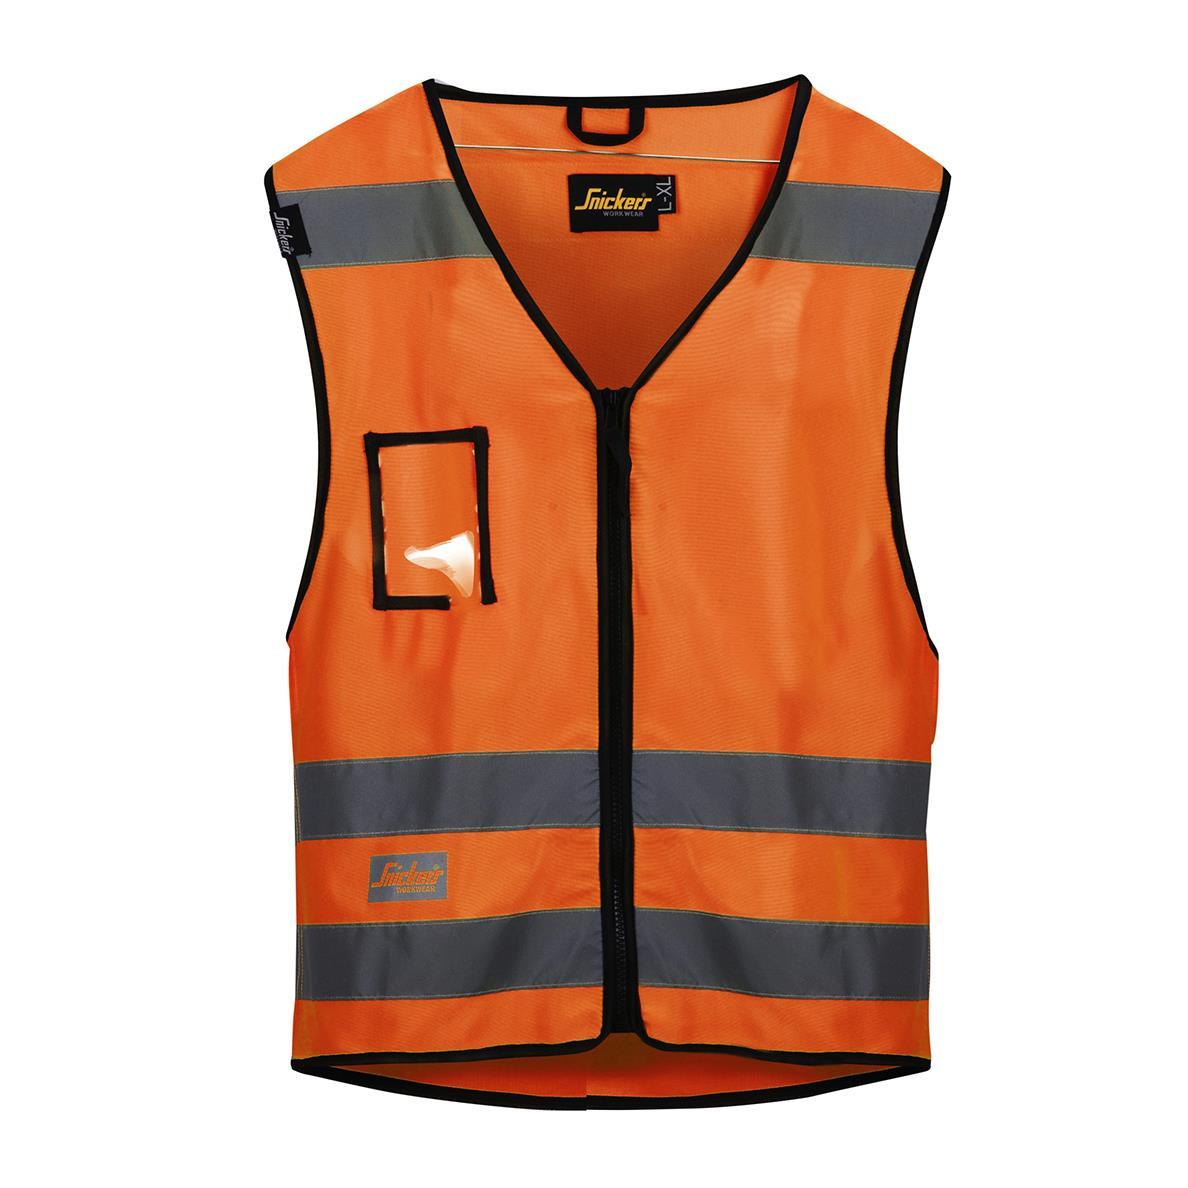 Snickers 9153 Väst varsel orange Strl L/XL